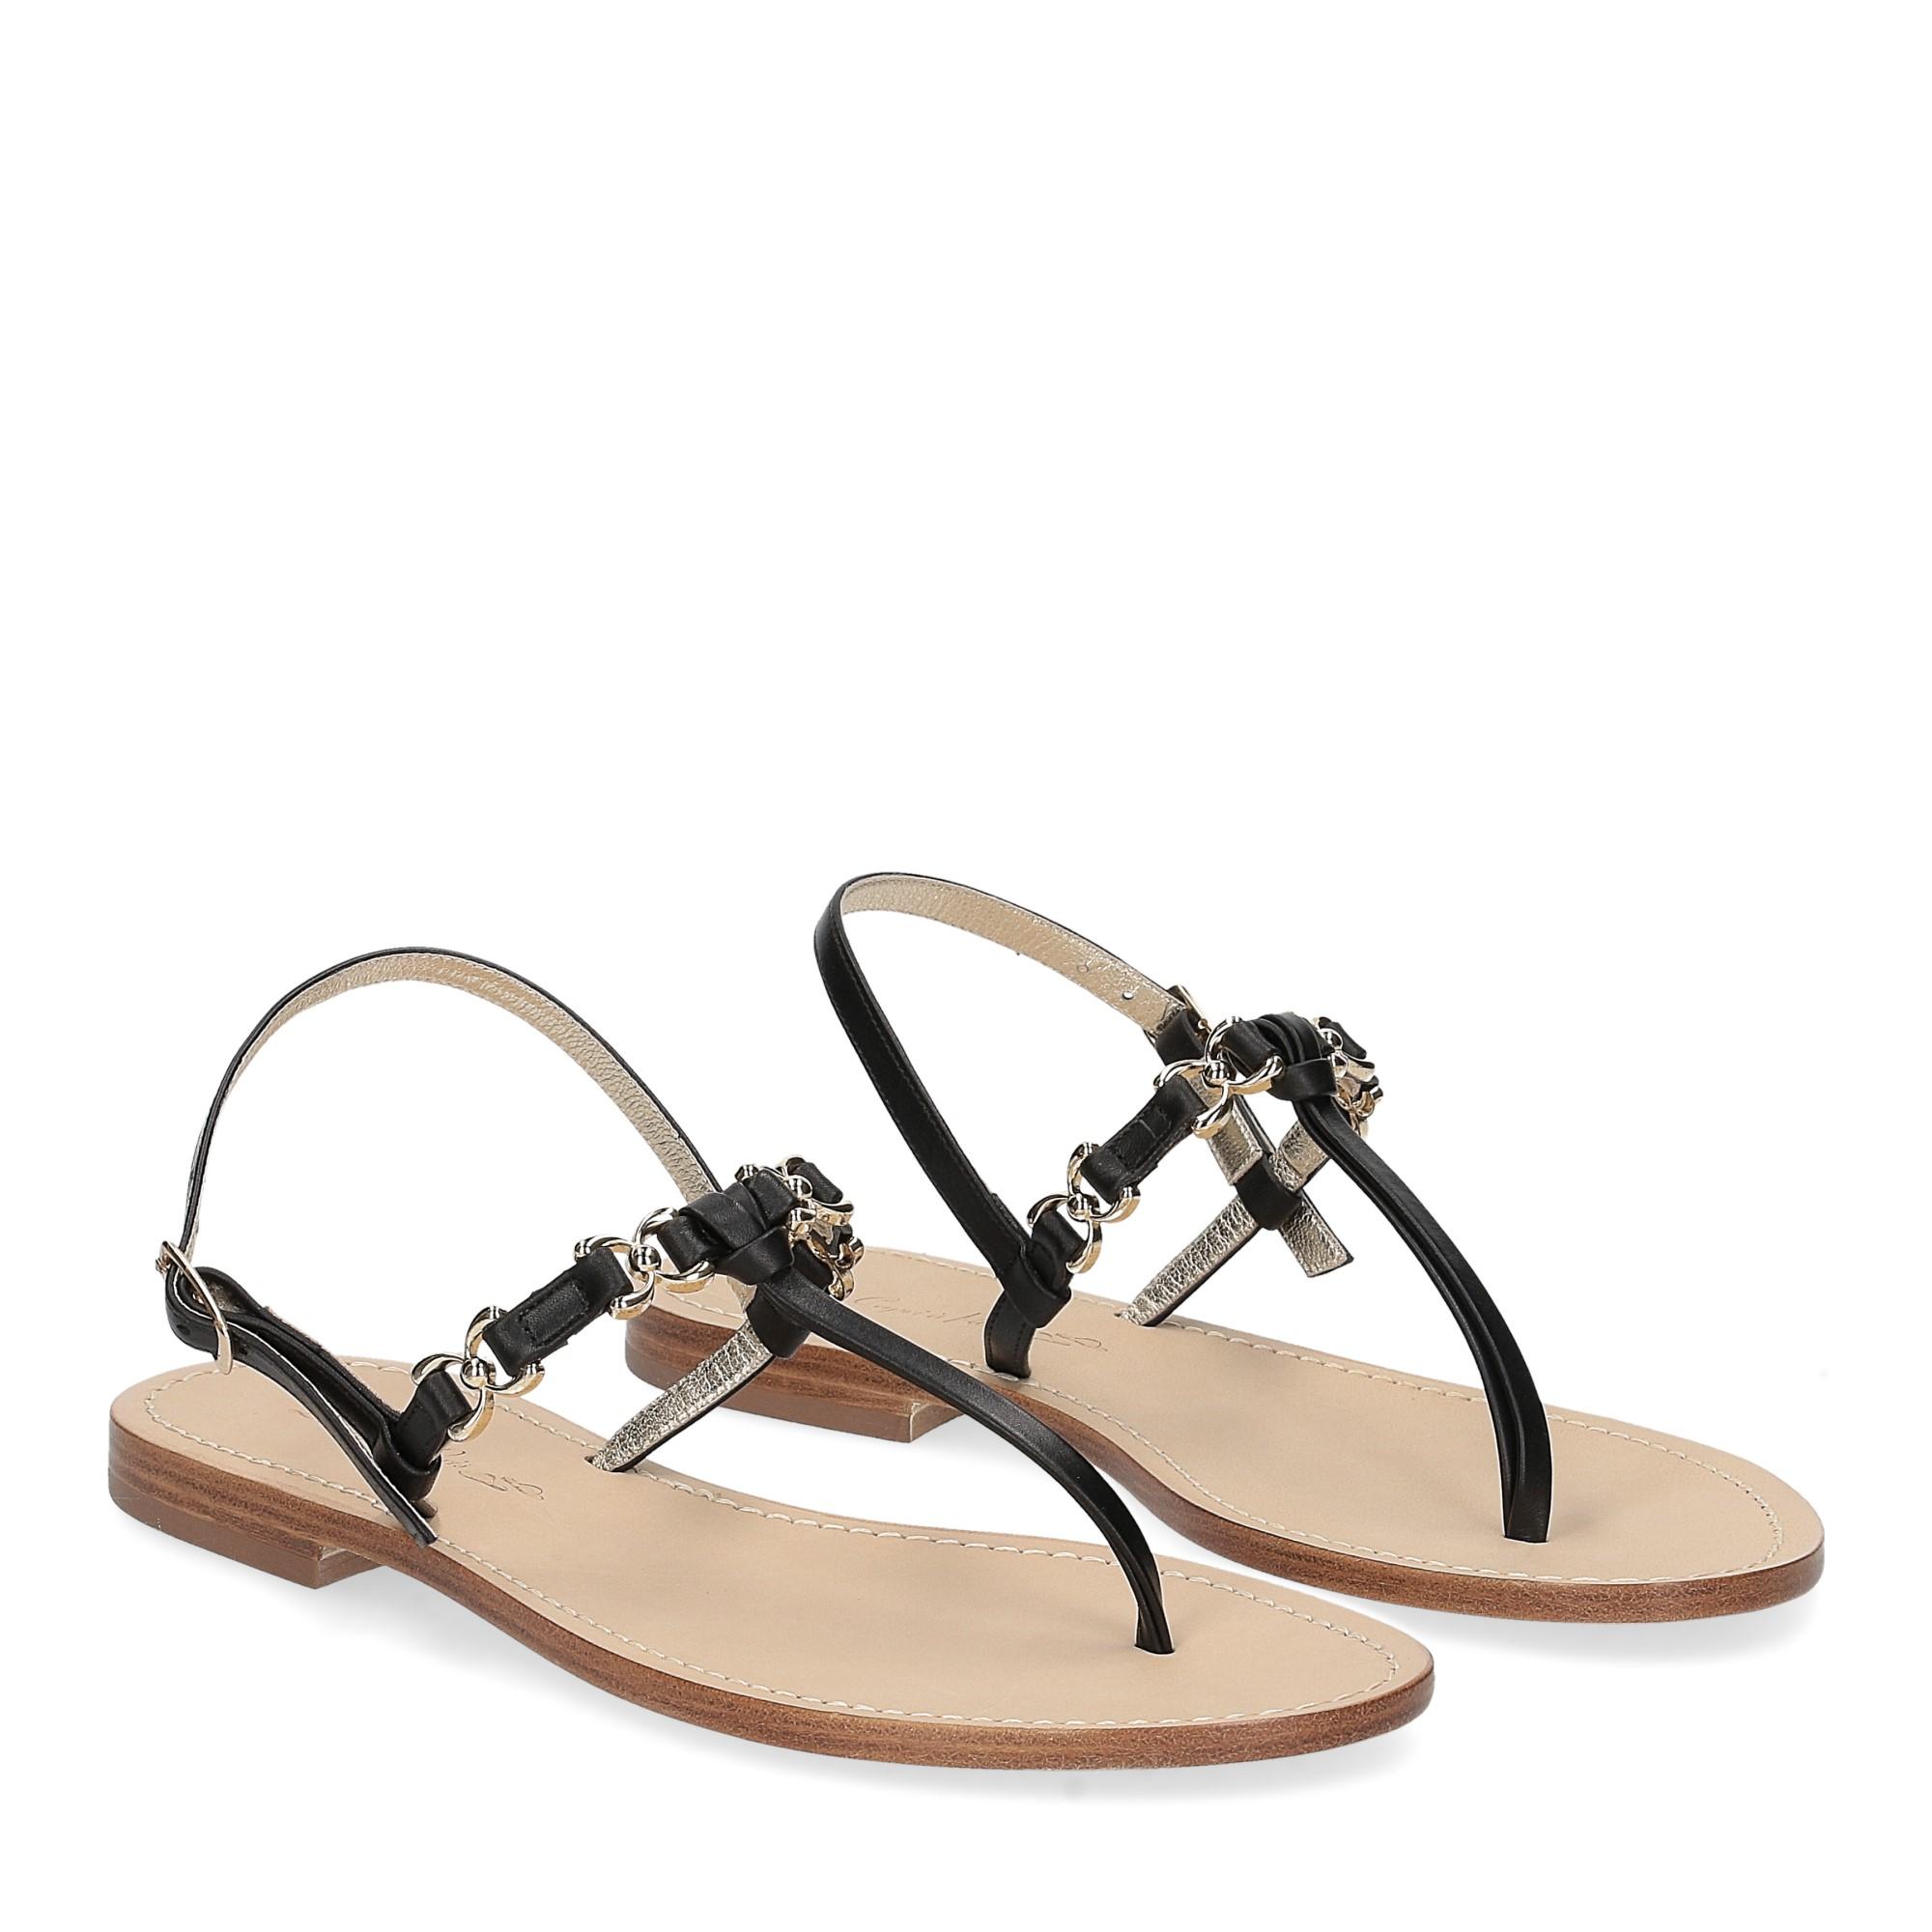 De Capri a Paris sandalo infradito nodino pelle nera